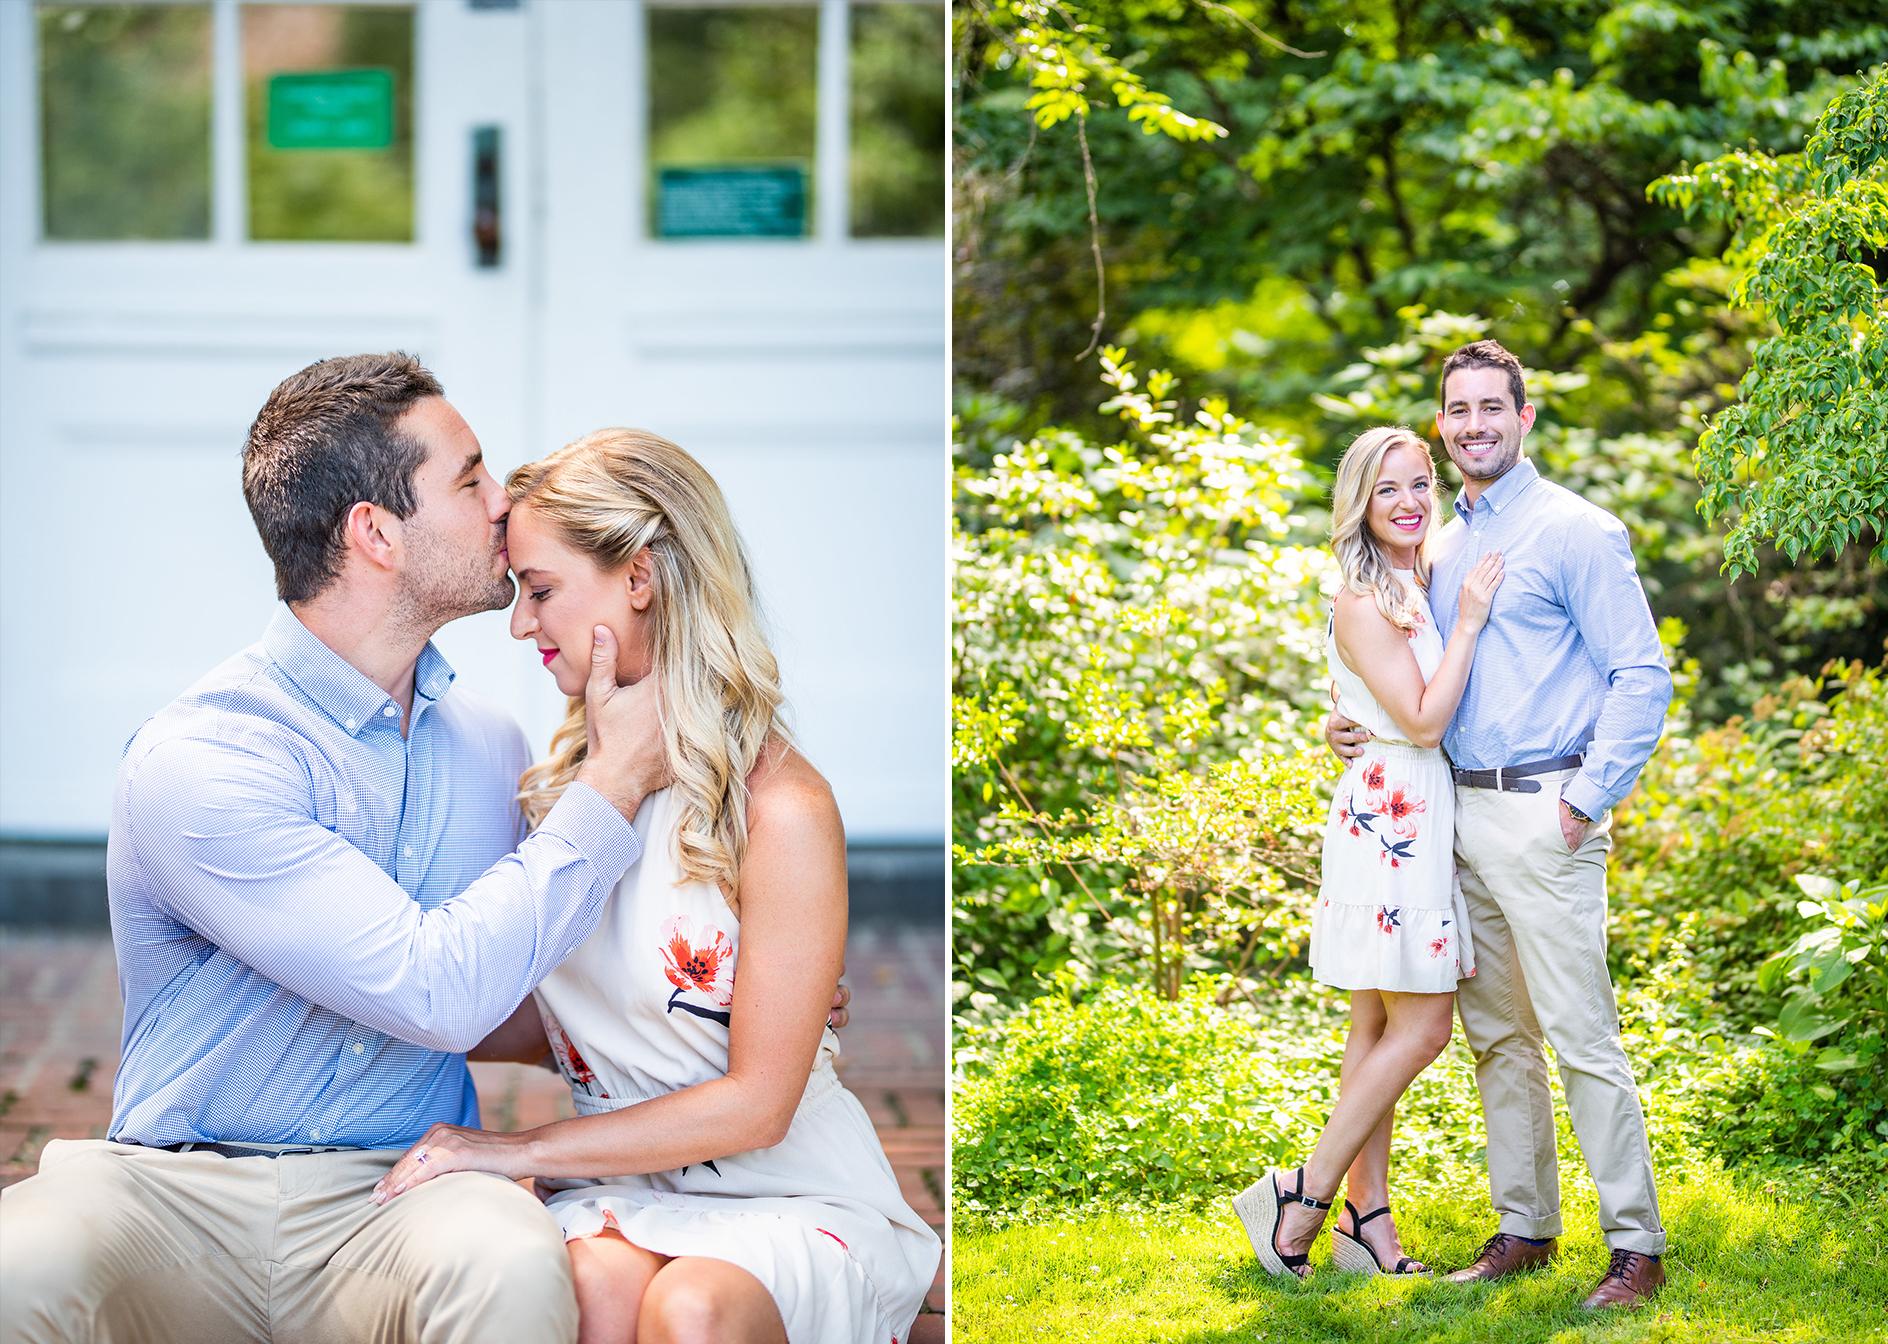 Planting Fields Arboretum Engagement Shoot | Oyster Bay Engagement Shoot | Long Island Wedding Photographer10